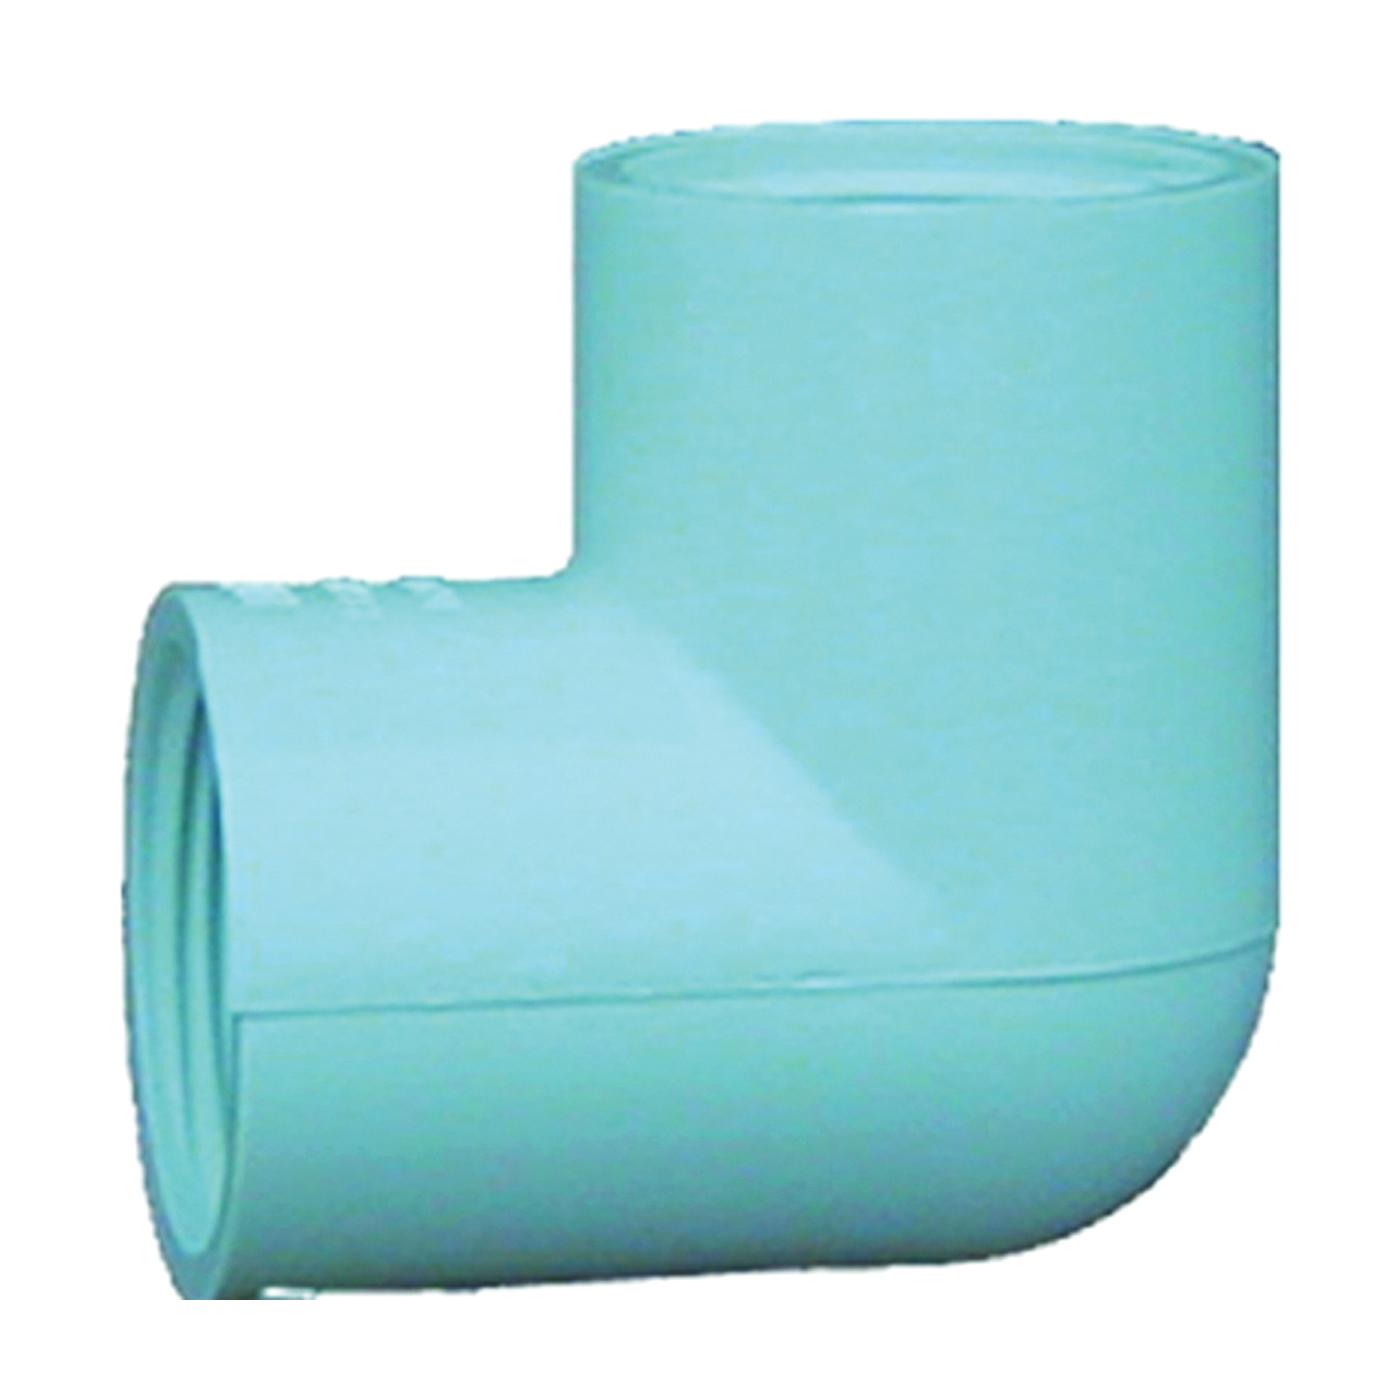 Picture of GENOVA 300 33714 Pipe Elbow, 1-1/4 in, FIP, 90 deg Angle, PVC, White, SCH 40 Schedule